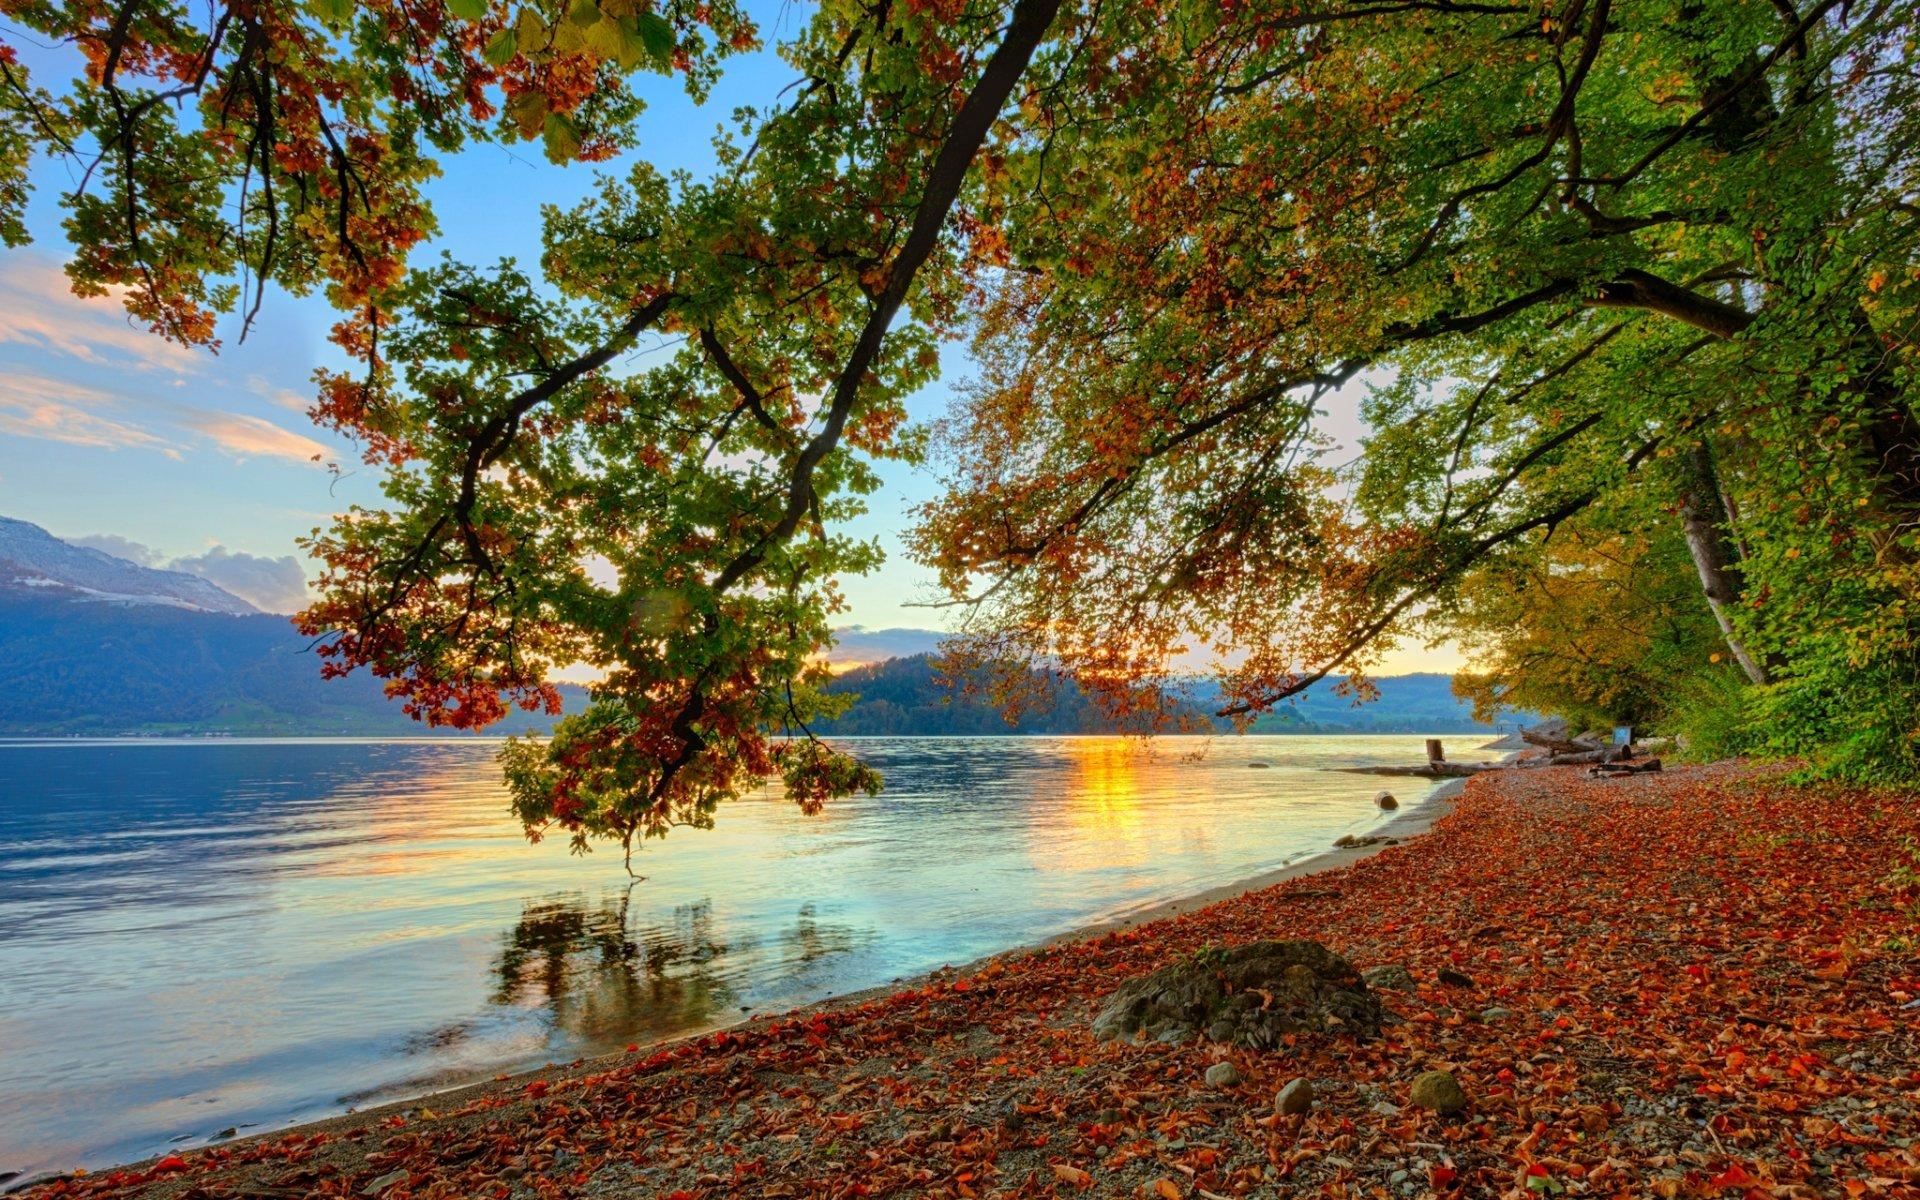 Hd Earth Wallpaper Widescreen Autumnal Tune Hd Wallpaper Background Image 2048x1280